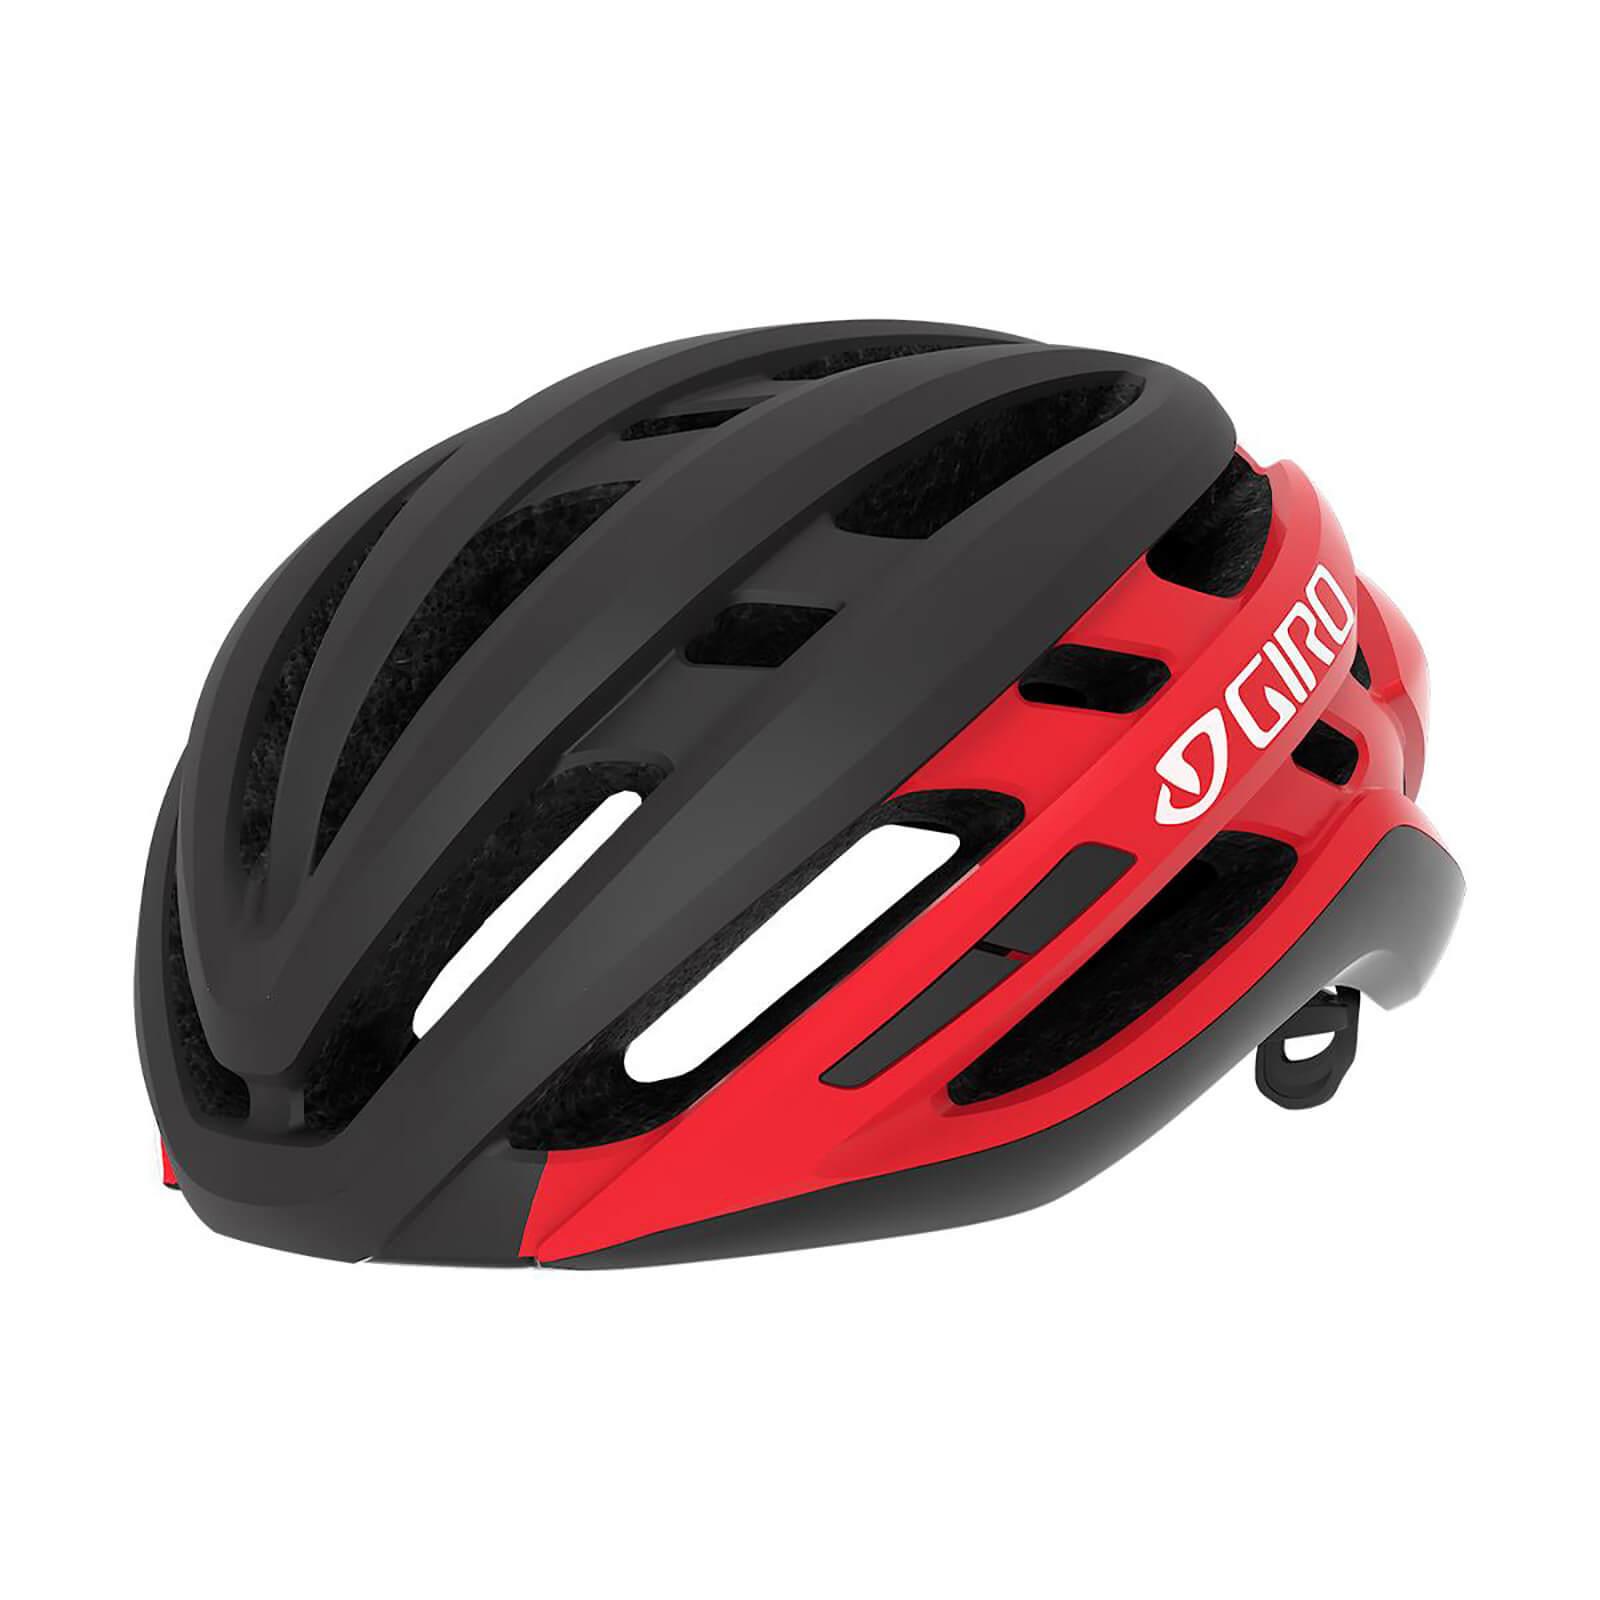 Giro Agilis MIPS Road Helmet - M/55-59cm - Matte Black/Bright Red